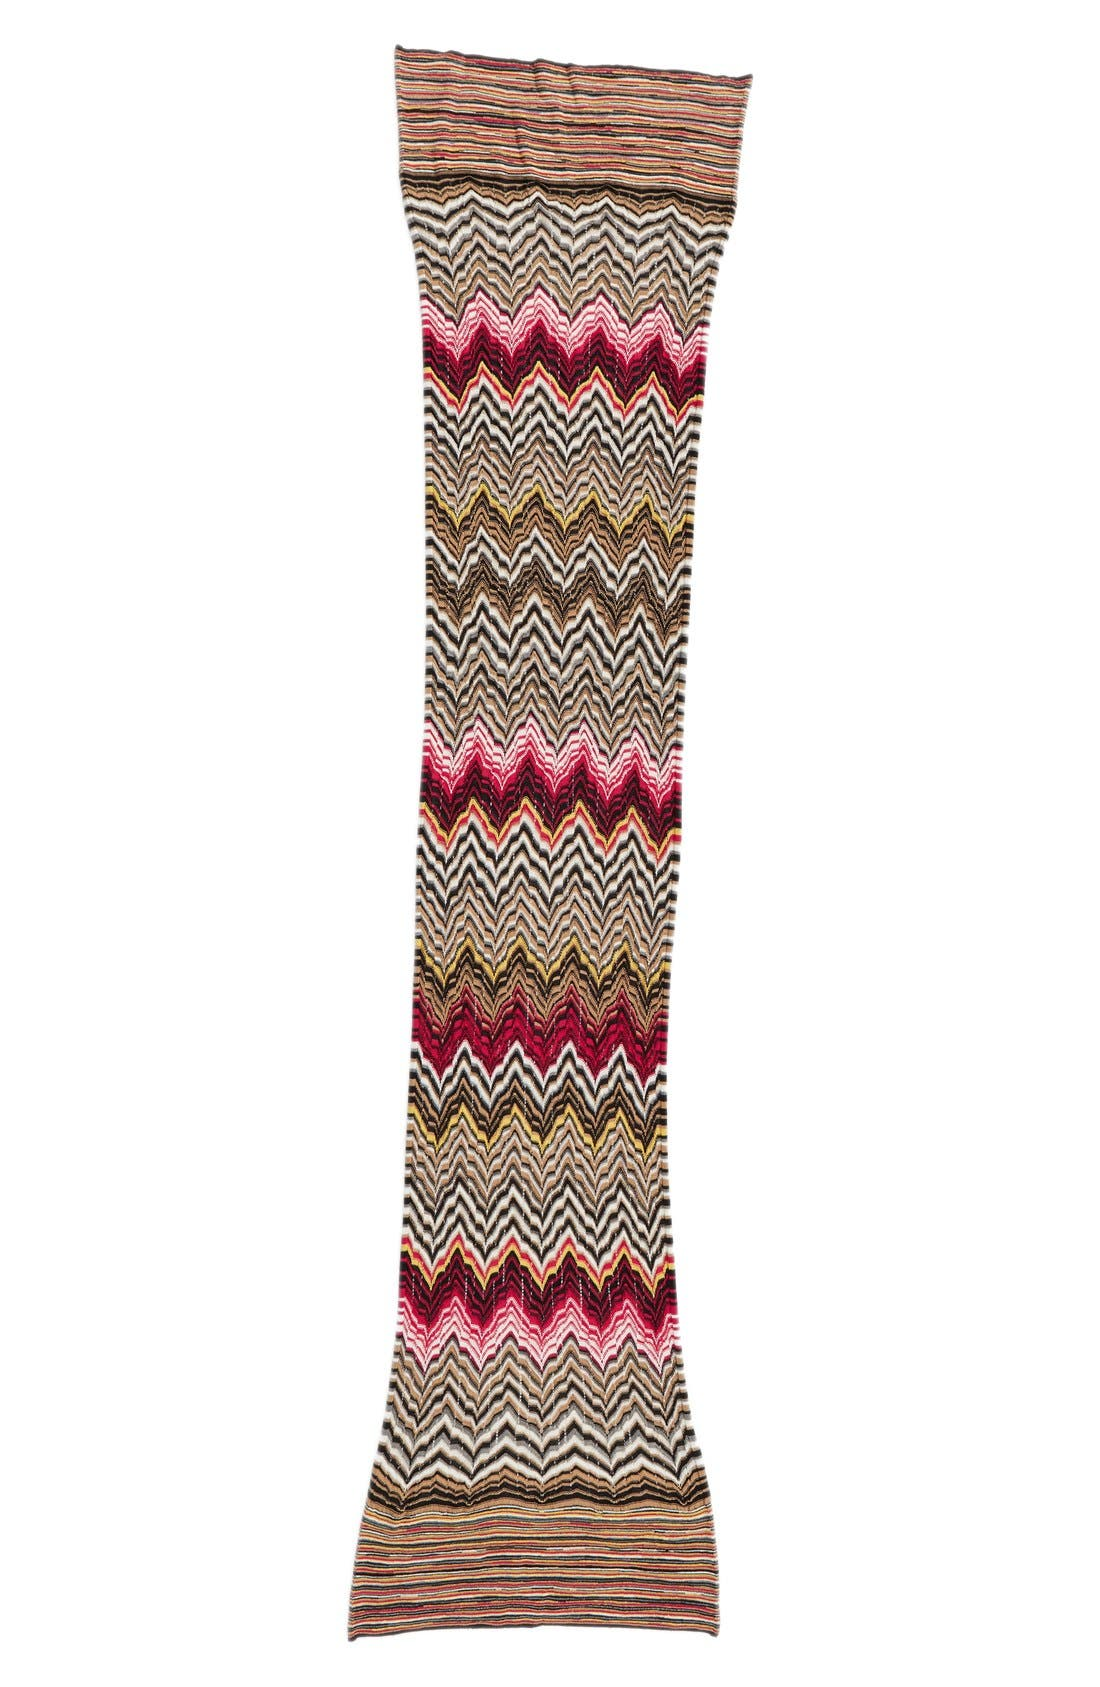 Alternate Image 1 Selected - Missoni Chevron & Stripe Scarf